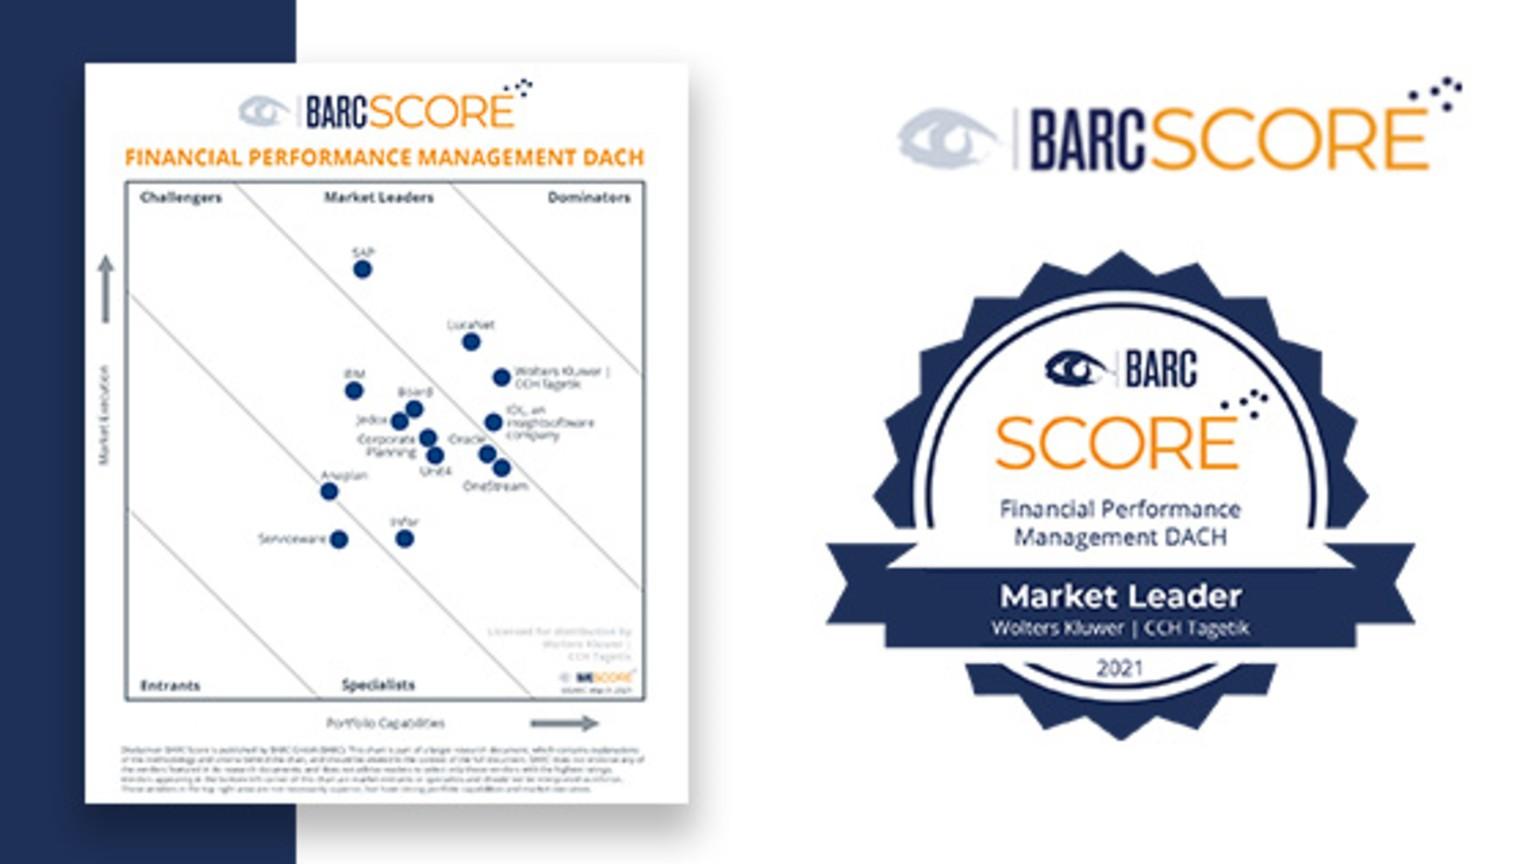 barc-score-financial-performance-dach-2021